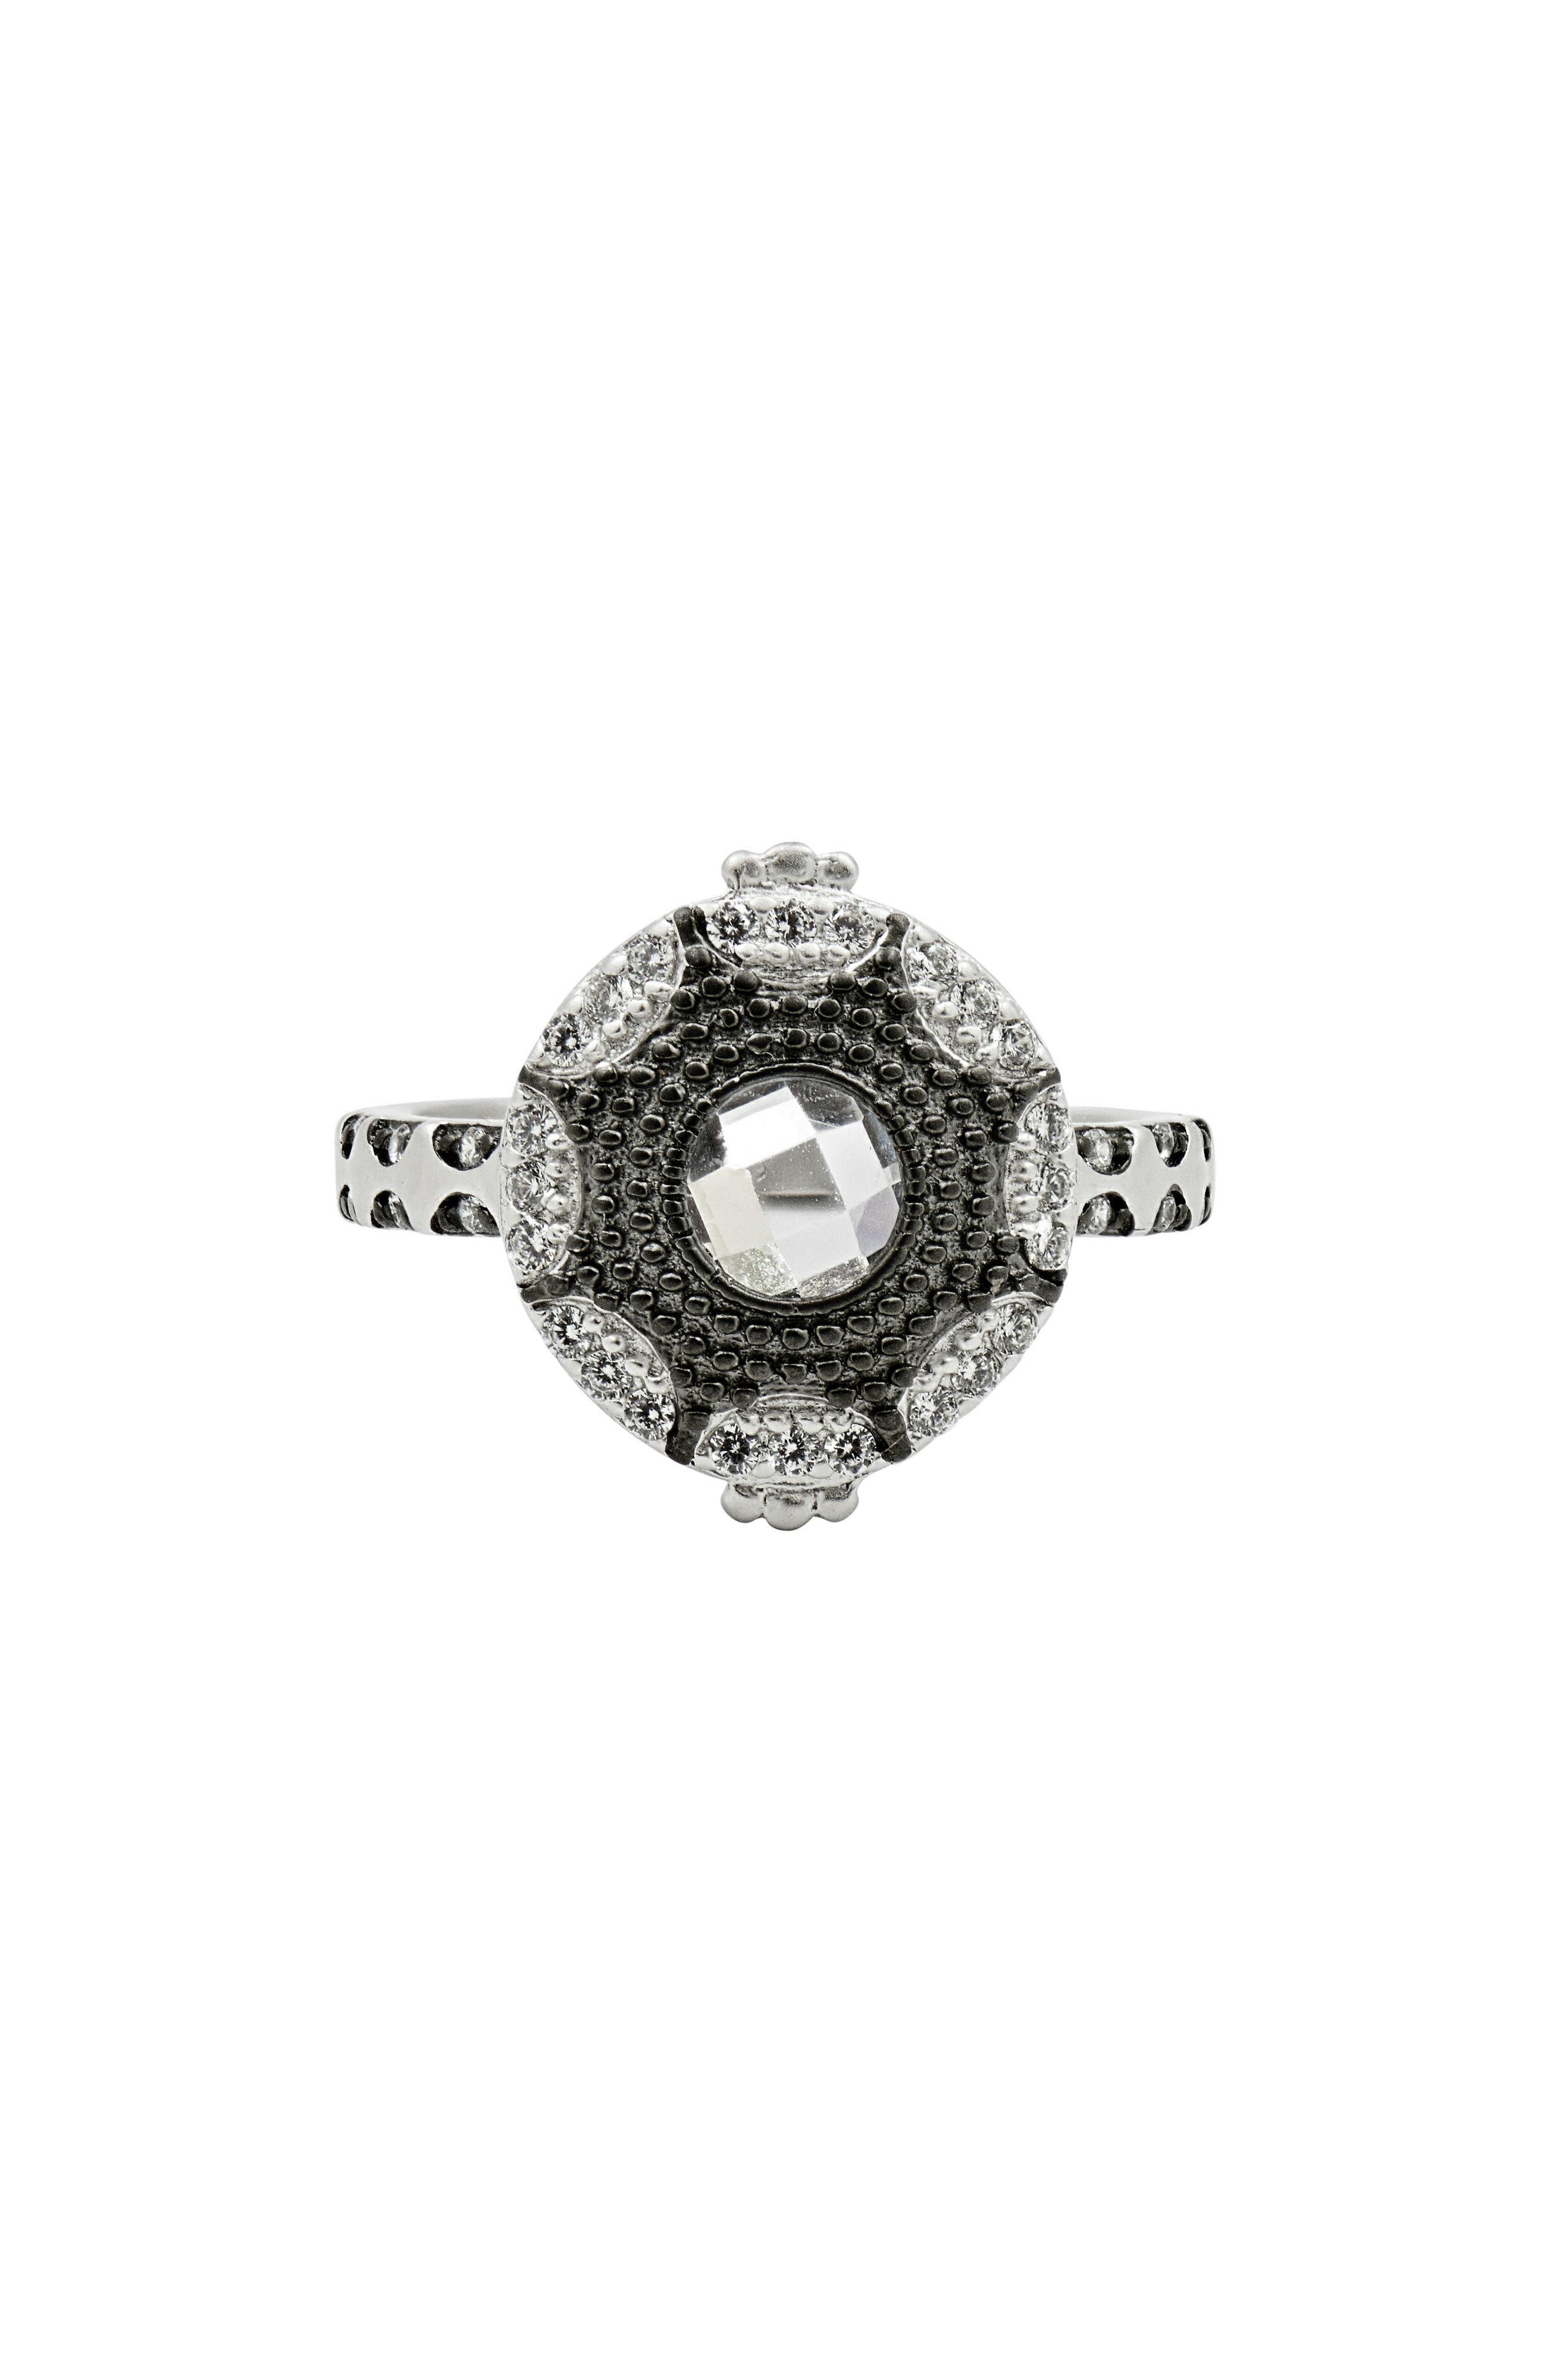 Signature Starburst Ring,                         Main,                         color, Silver/ Black